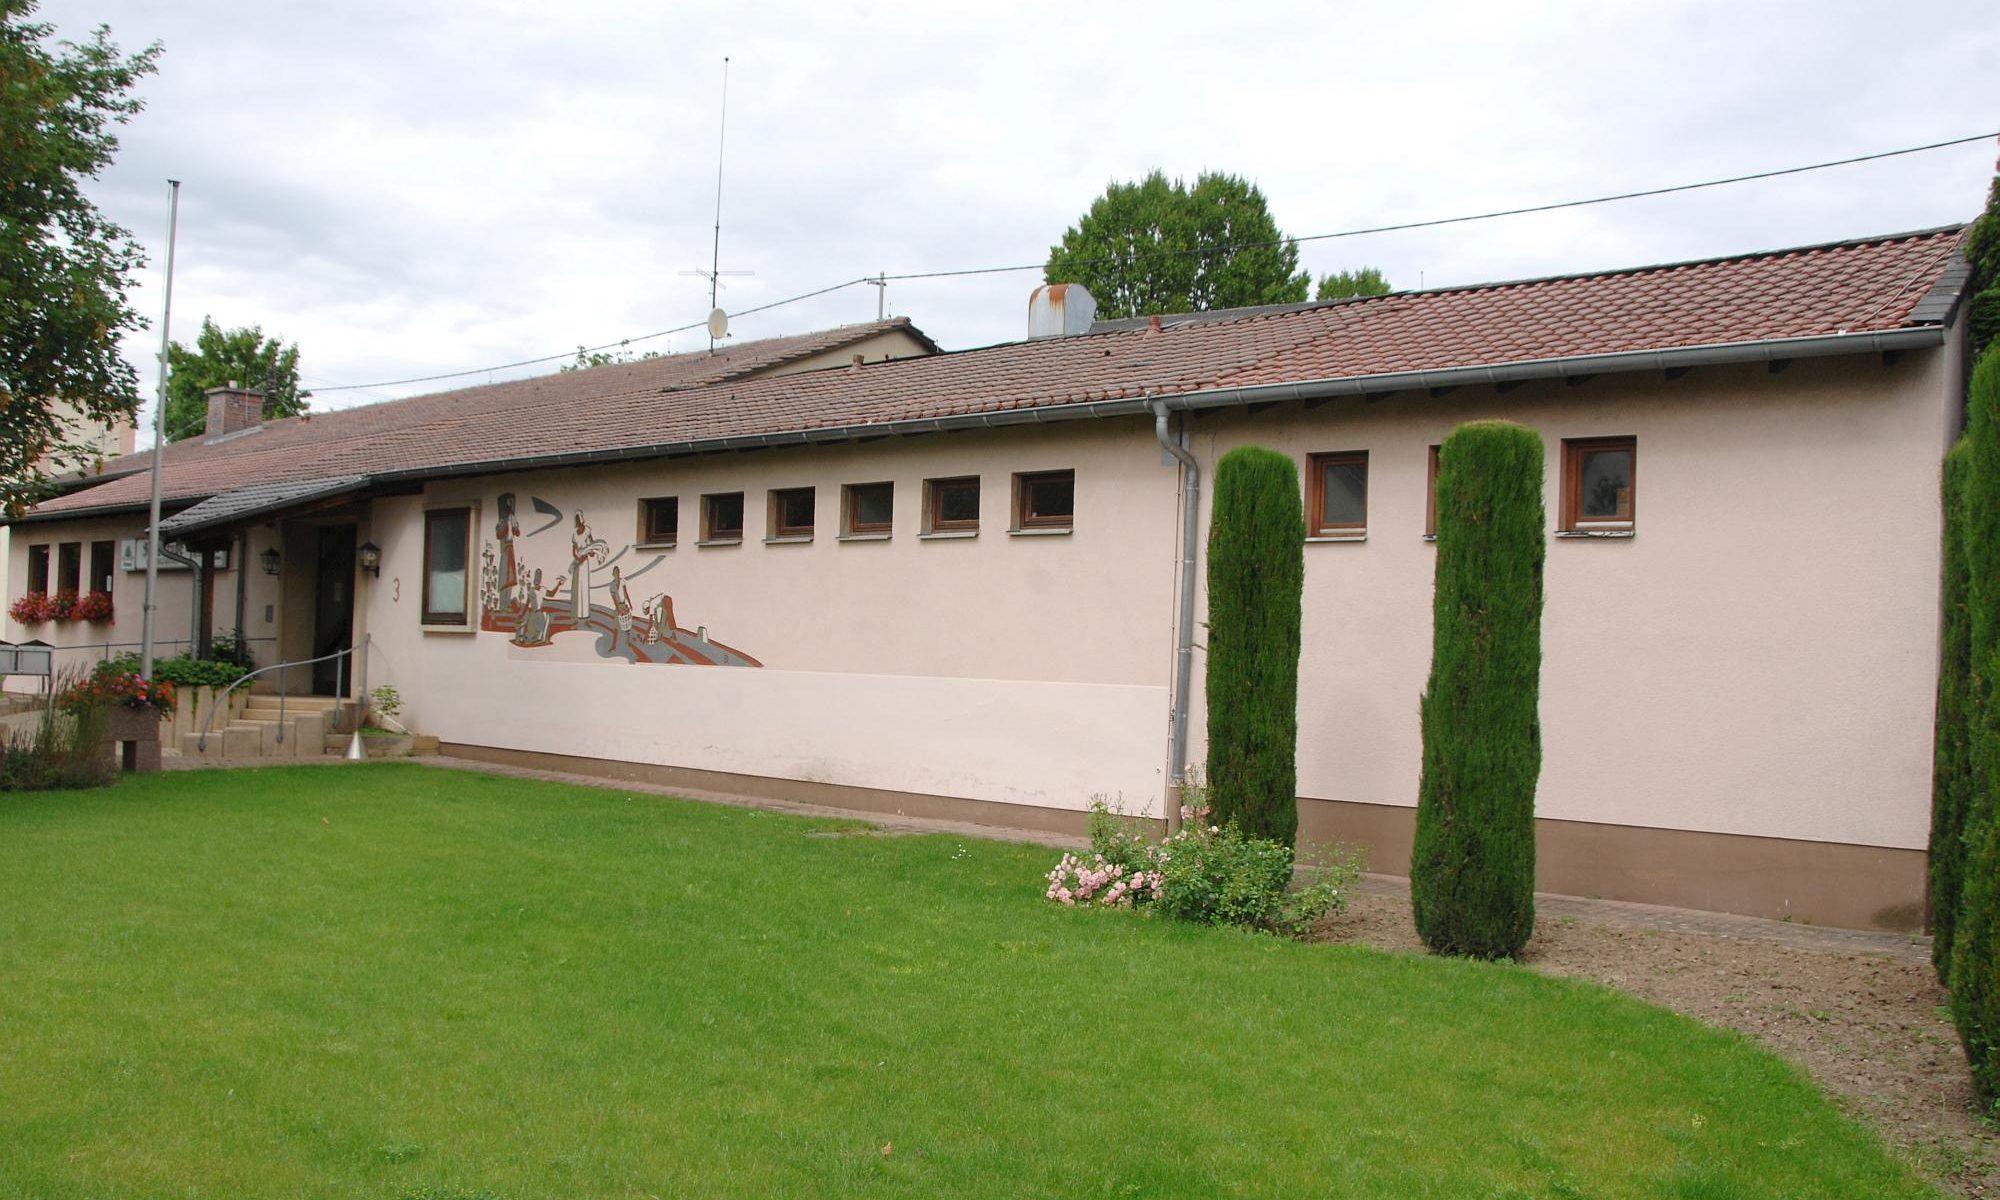 Das Bürgerhaus in Heuchelheim bei Frankenthal